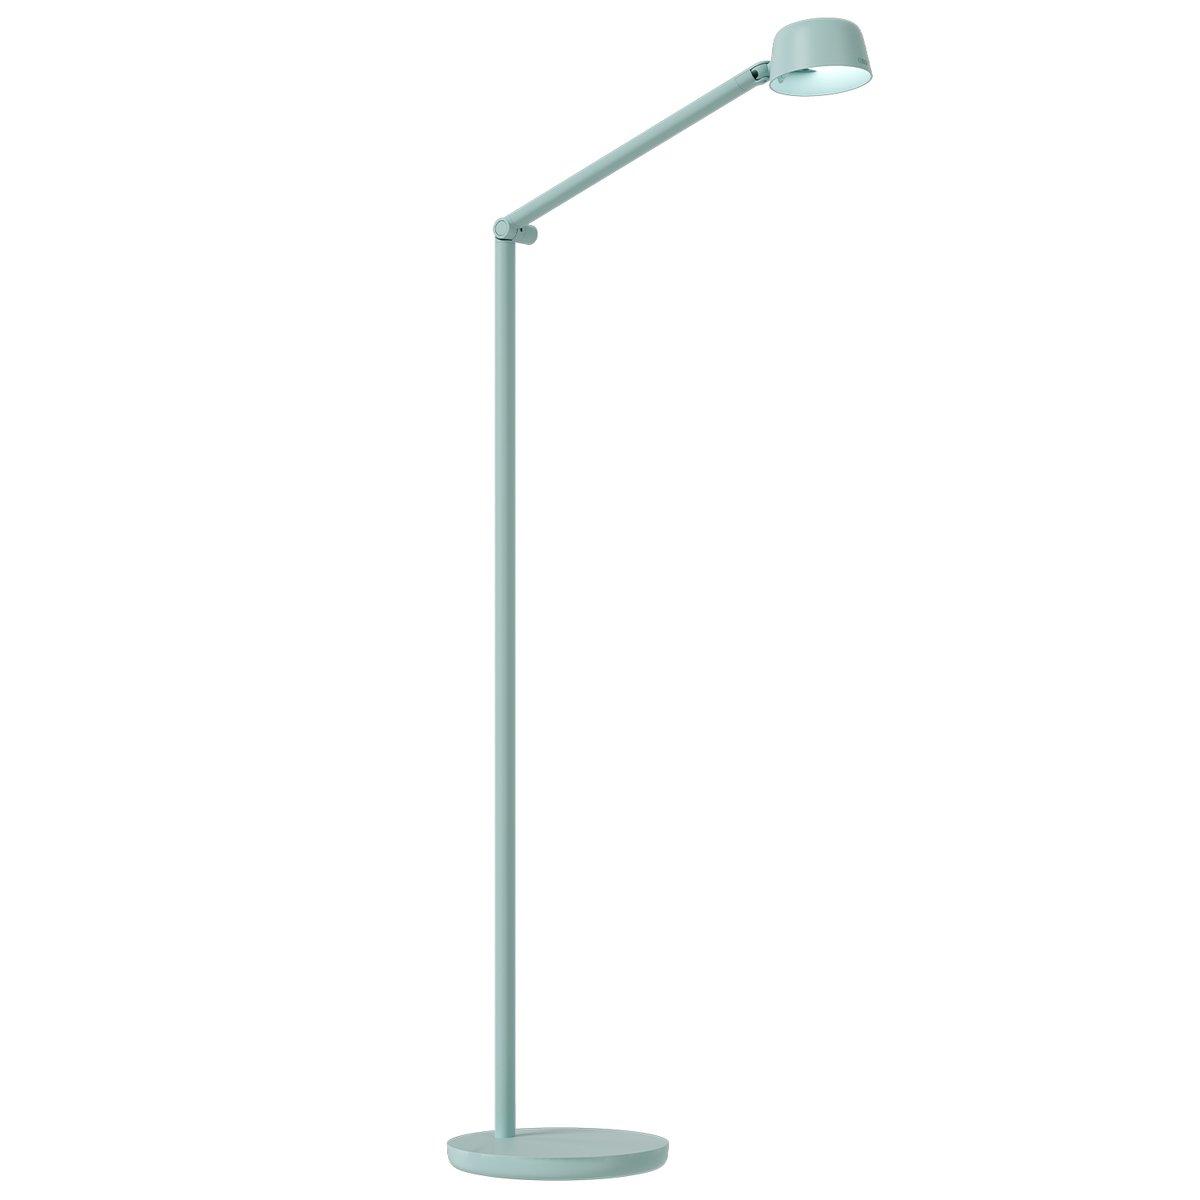 Luxo Motus Floor-2 Floor Lamp, Silk Teal